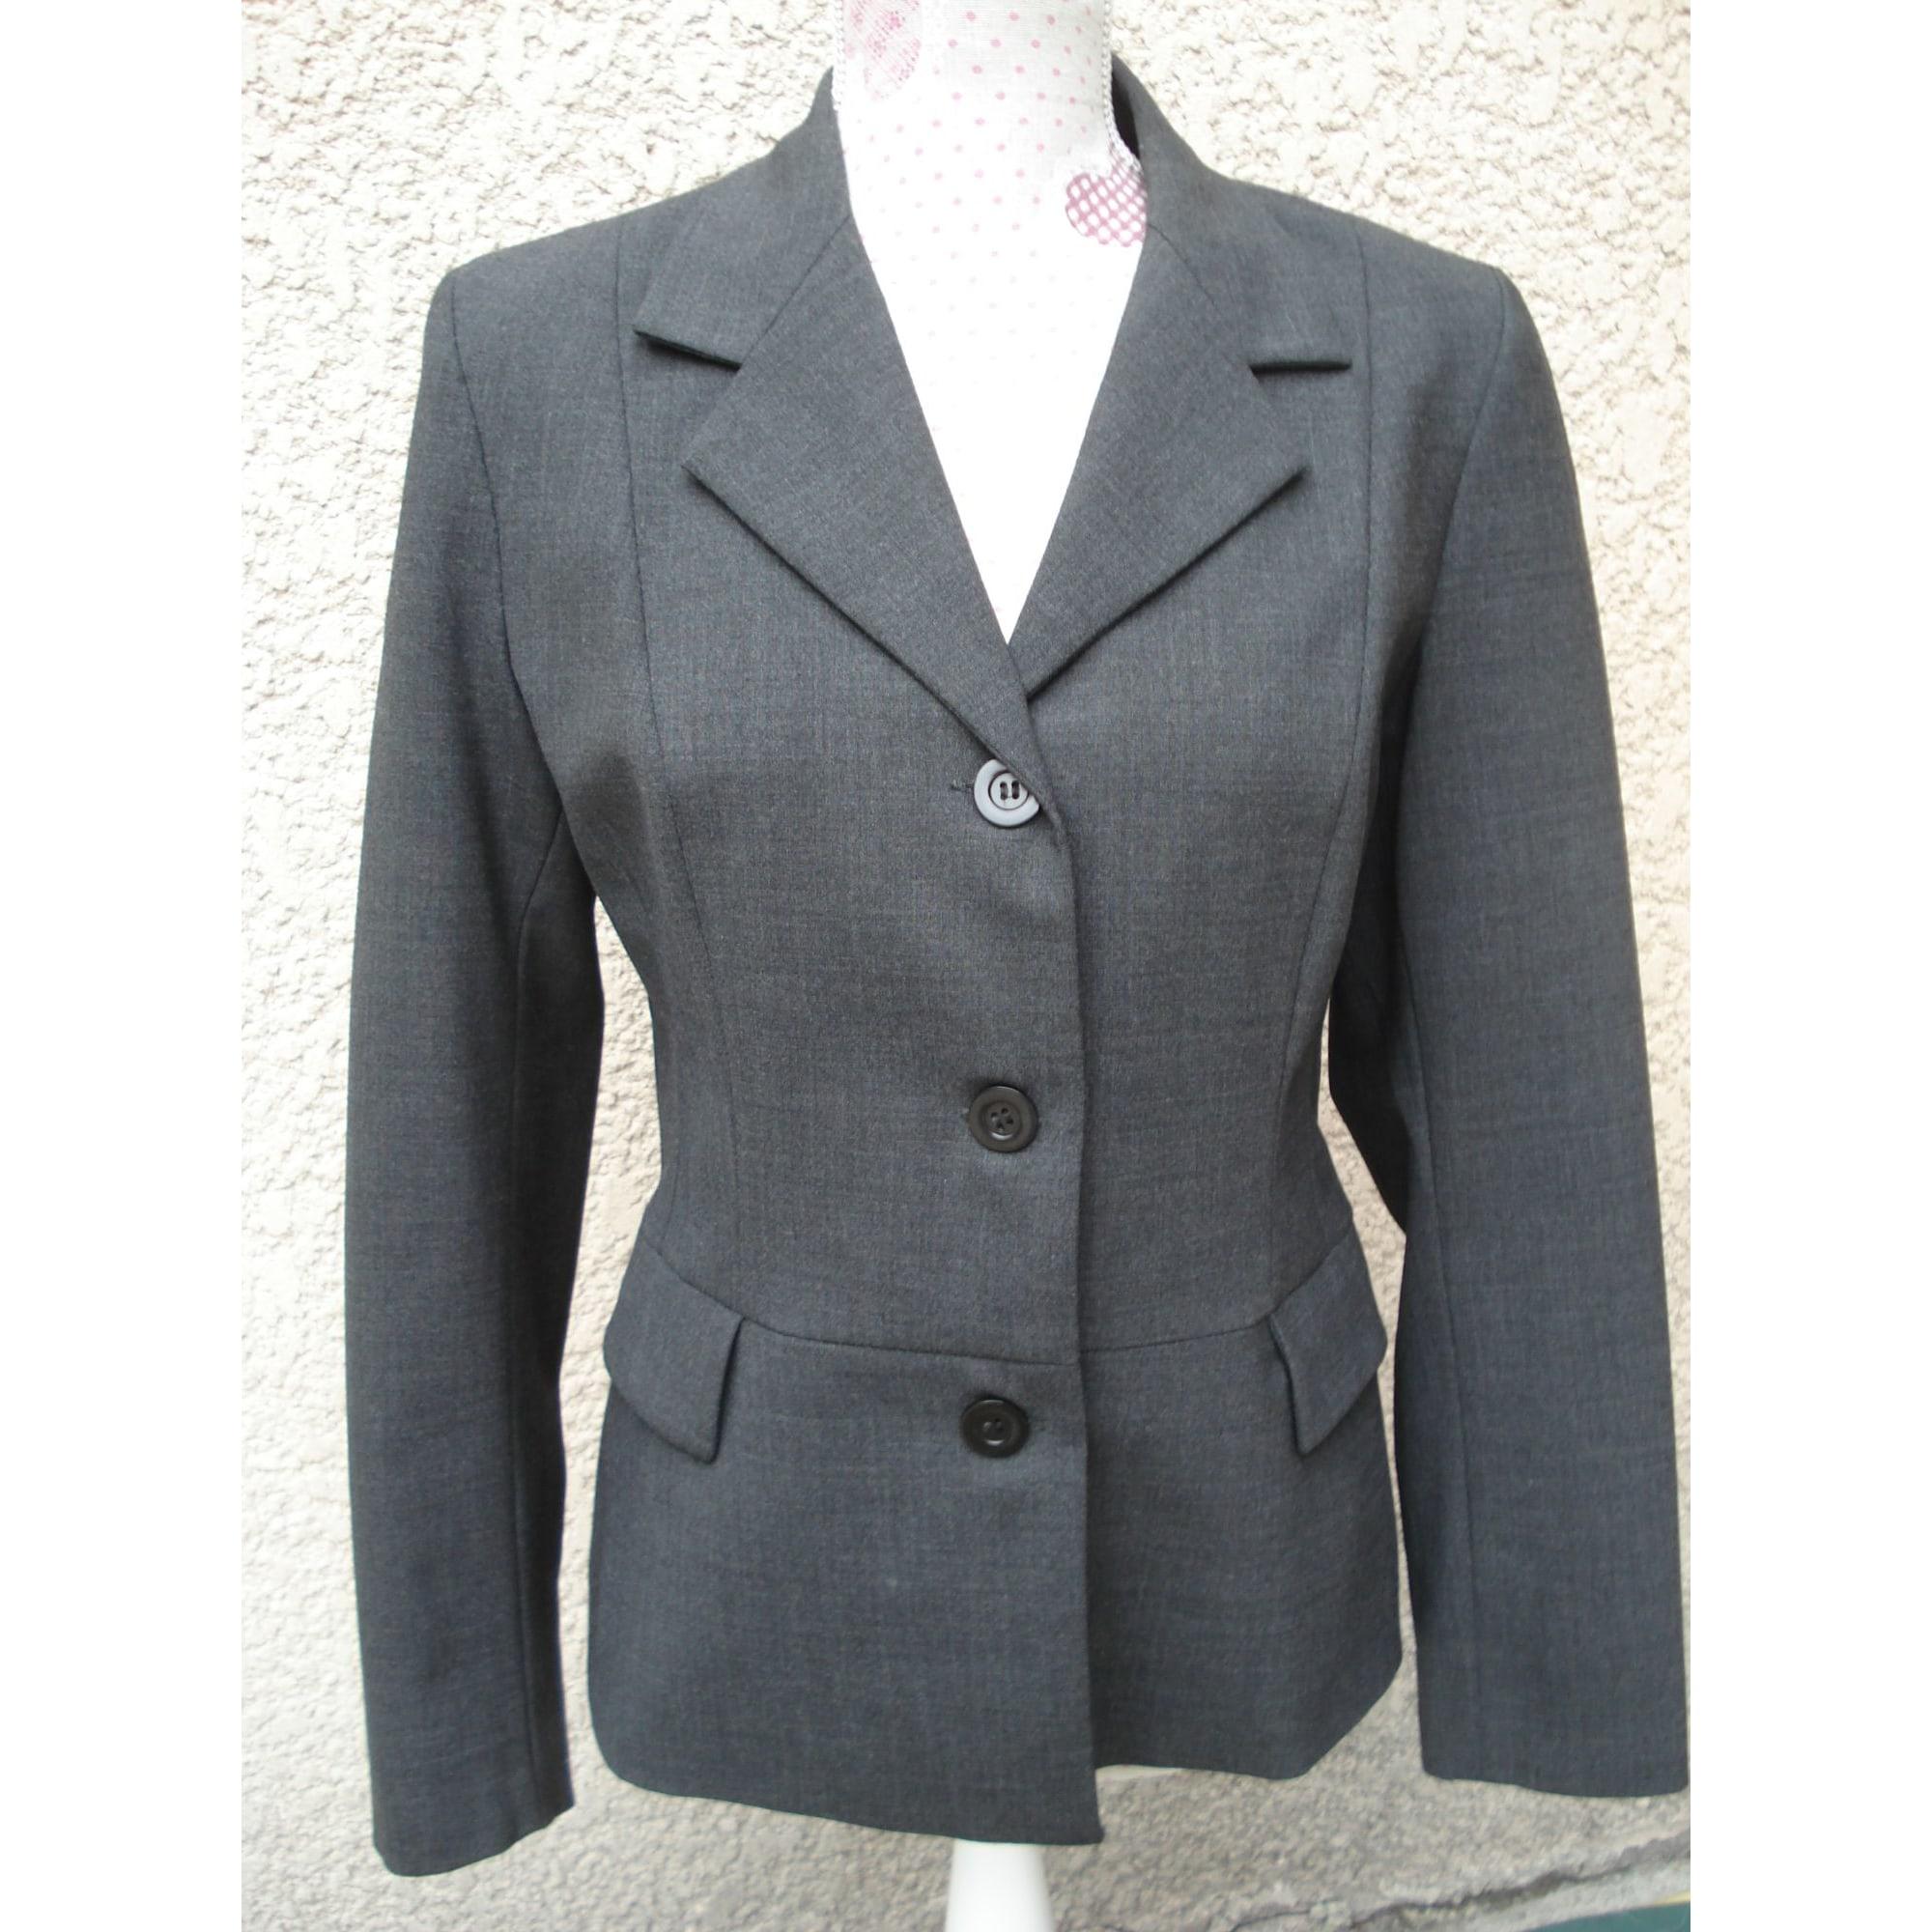 Blazer, veste tailleur LOLA Gris, anthracite